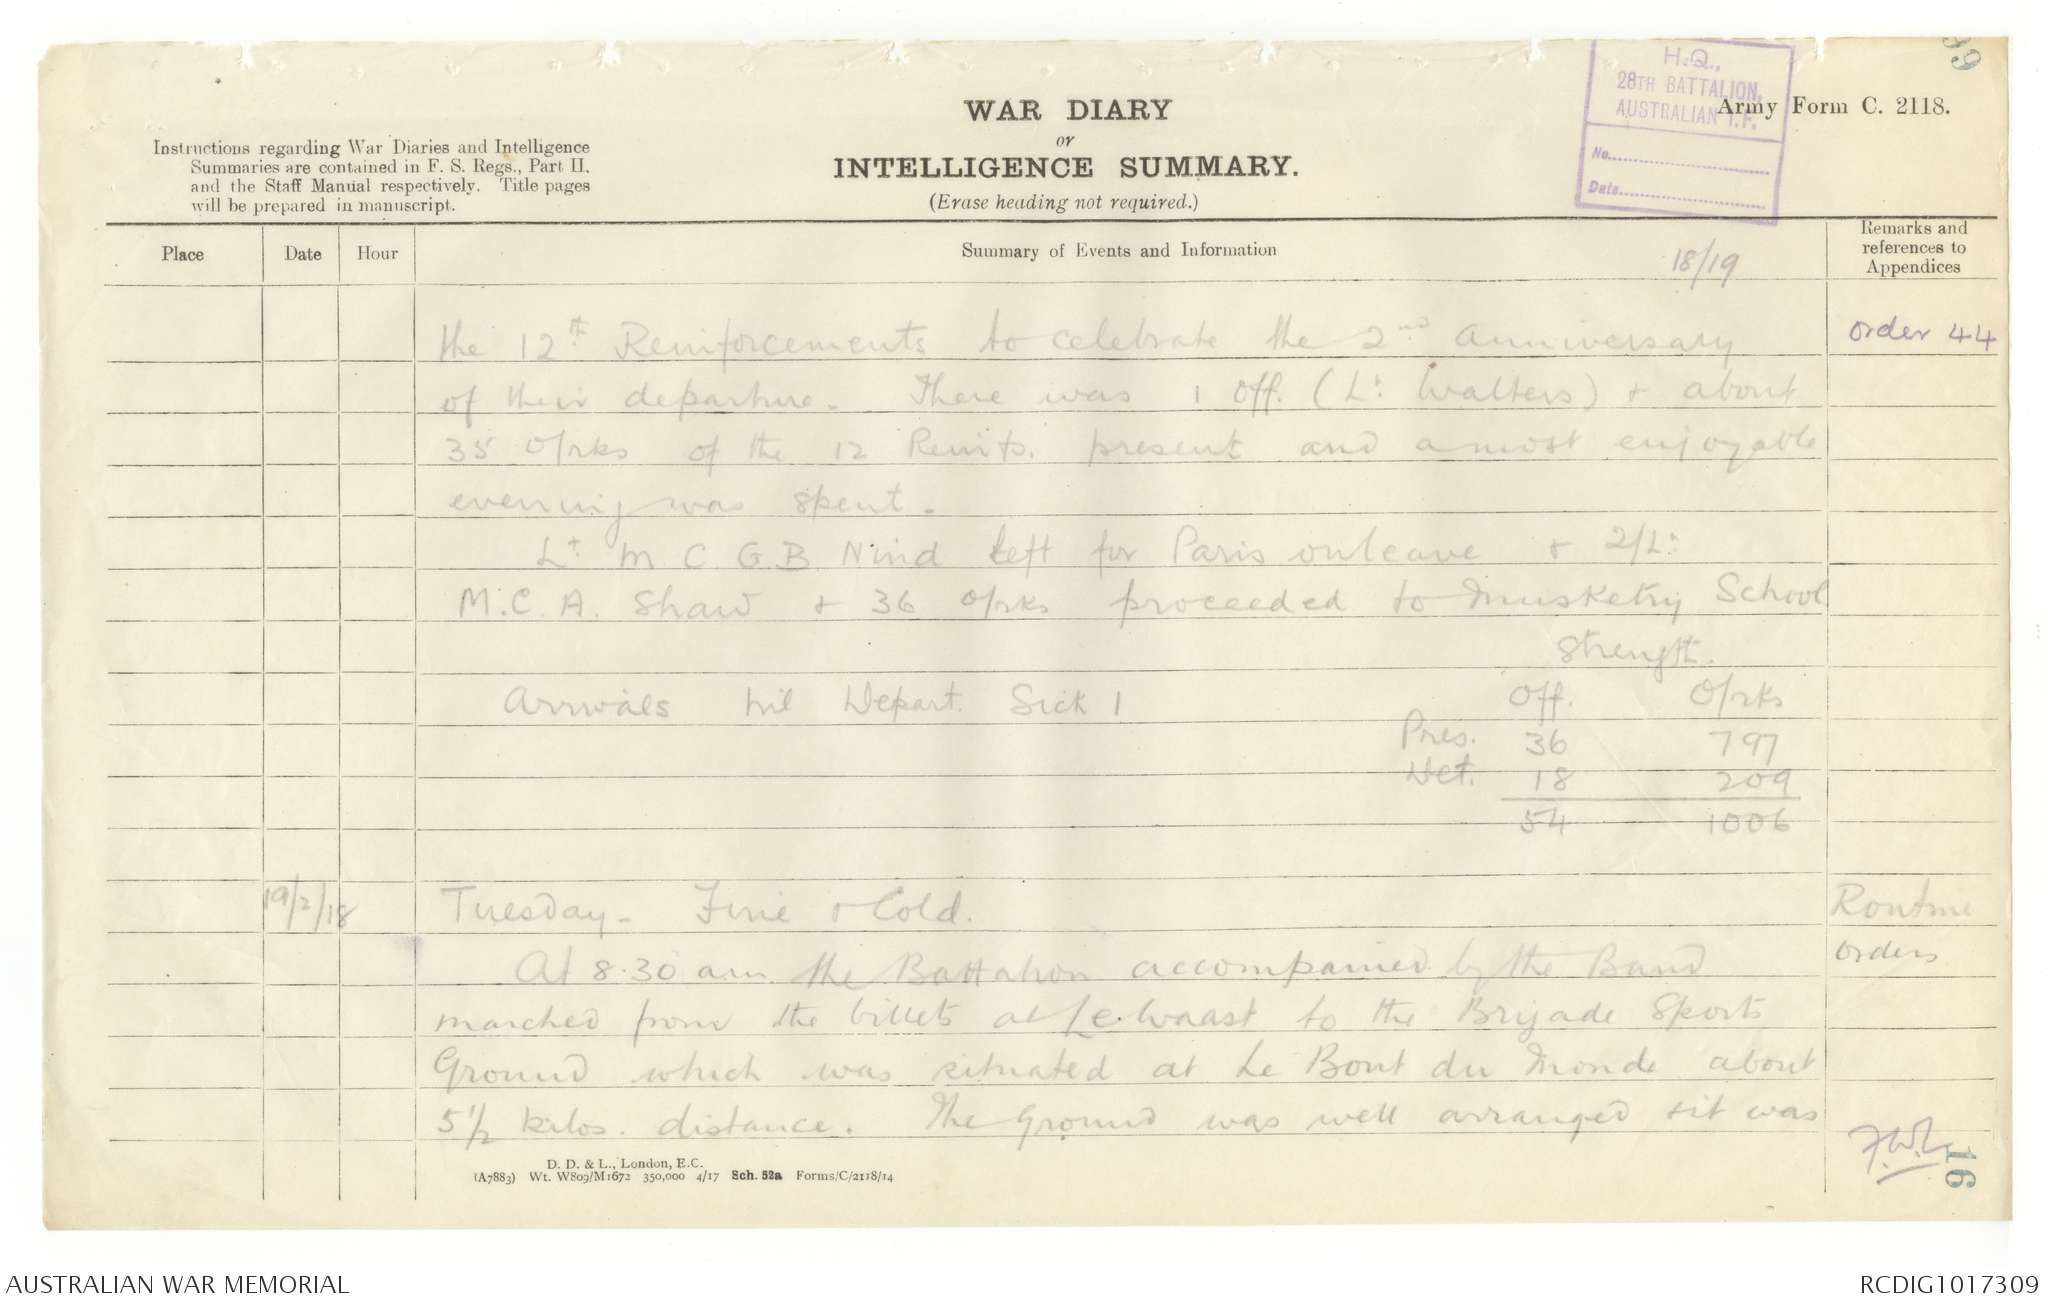 AWM4 23/45/35 - February 1918   The Australian War Memorial